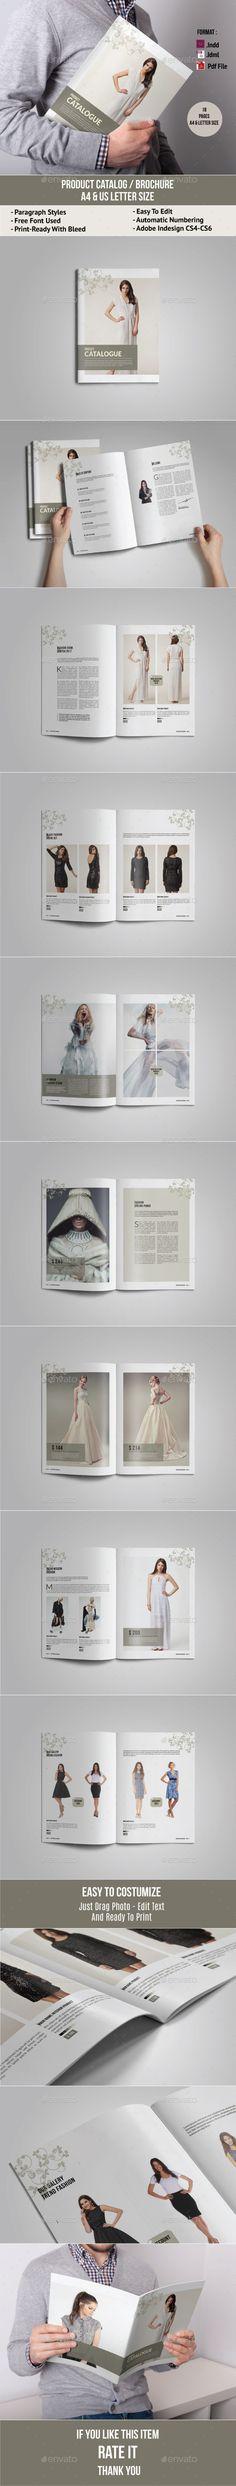 Brand Manual Template InDesign INDD #design Download   - it manual templates to download